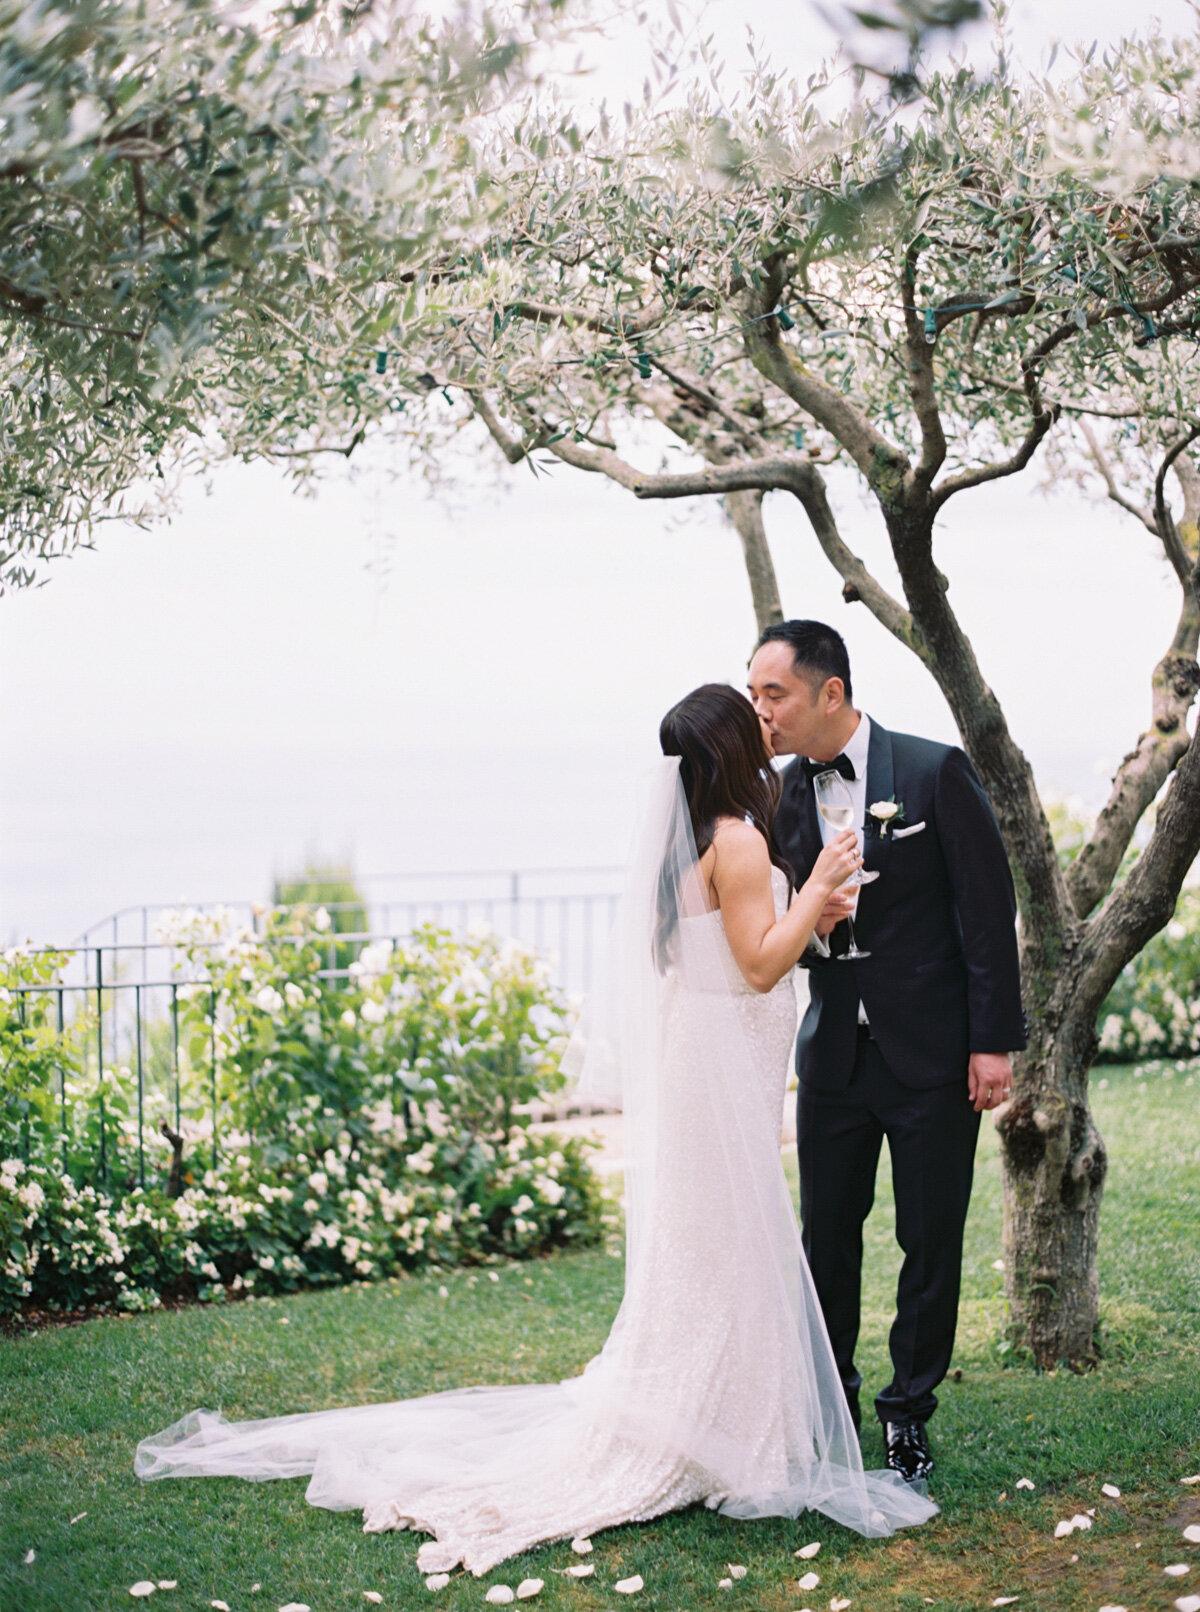 Belmond-Hotel-Caruso-ravello-elopement-Katie-Grant-destination-wedding (35 of 50).jpg